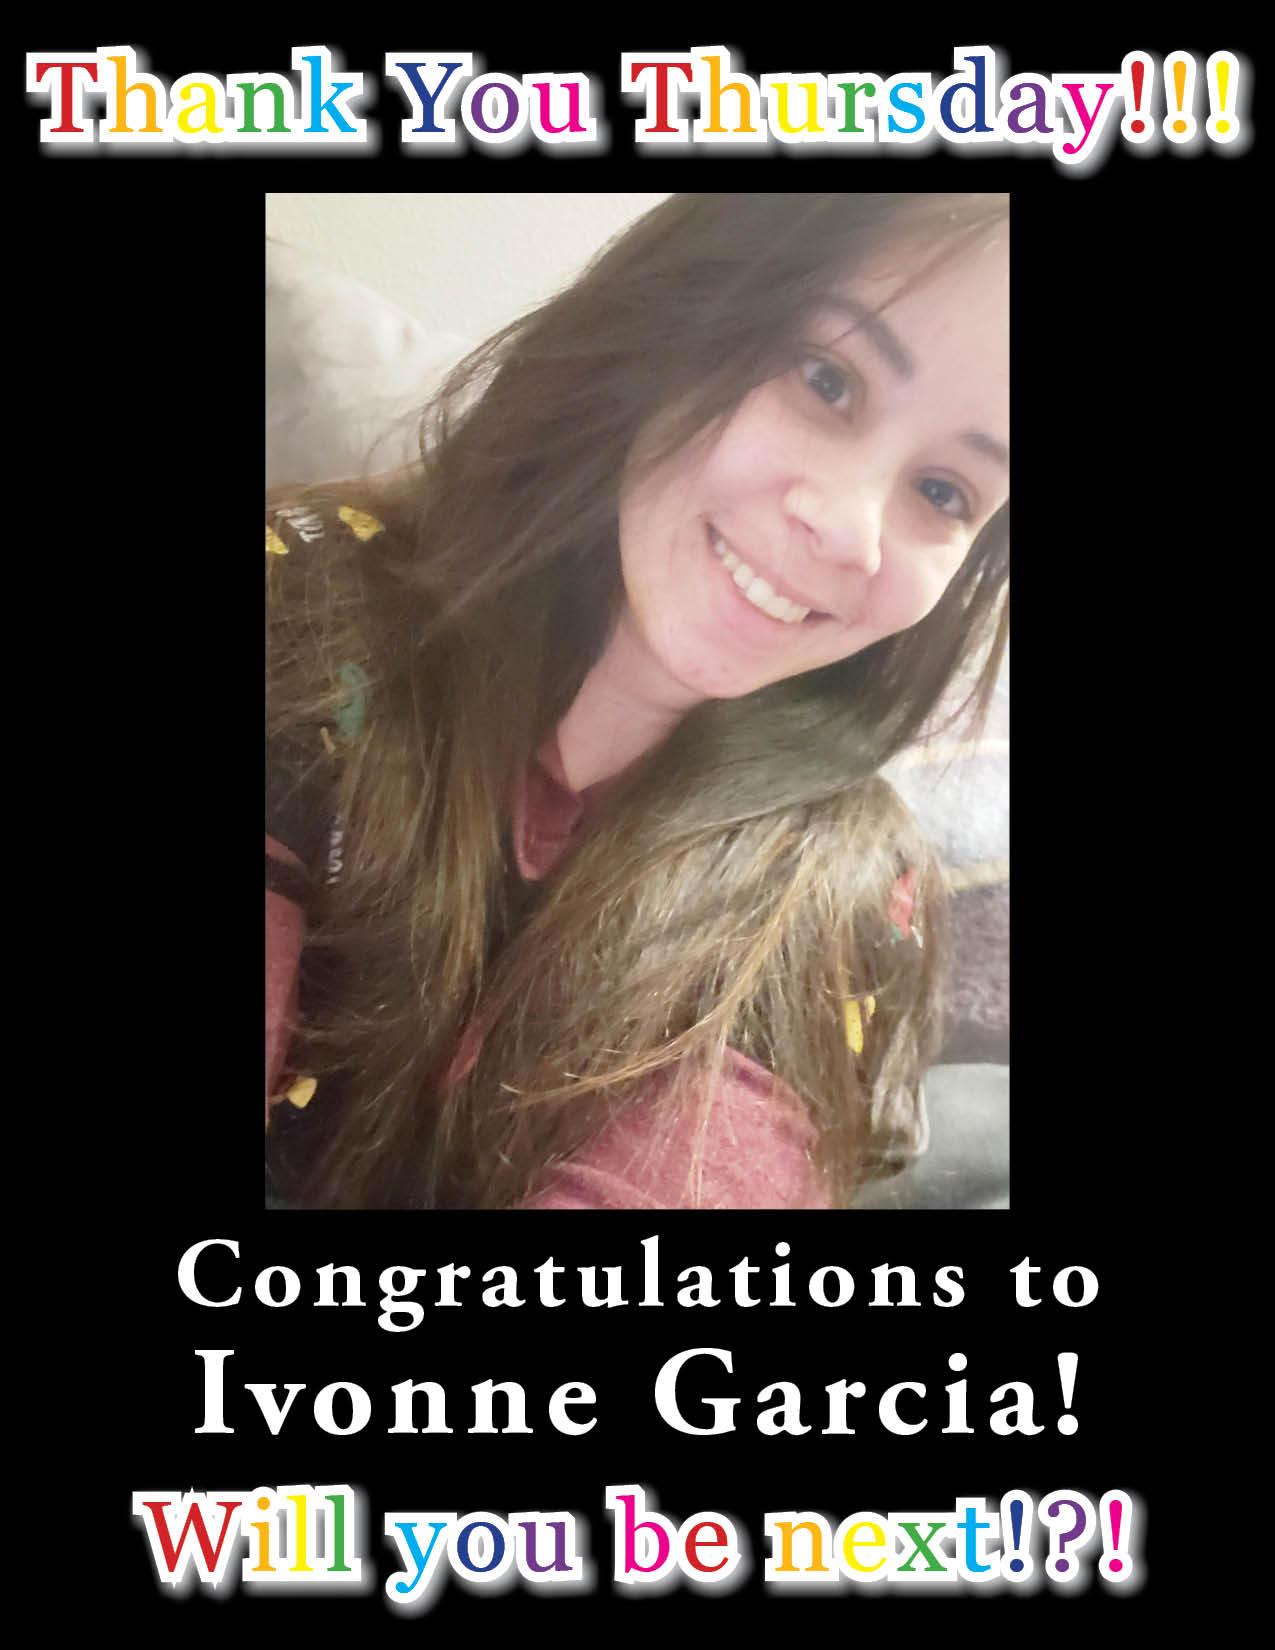 Photo of Thank You Thursday recipient Ivonne Garcia